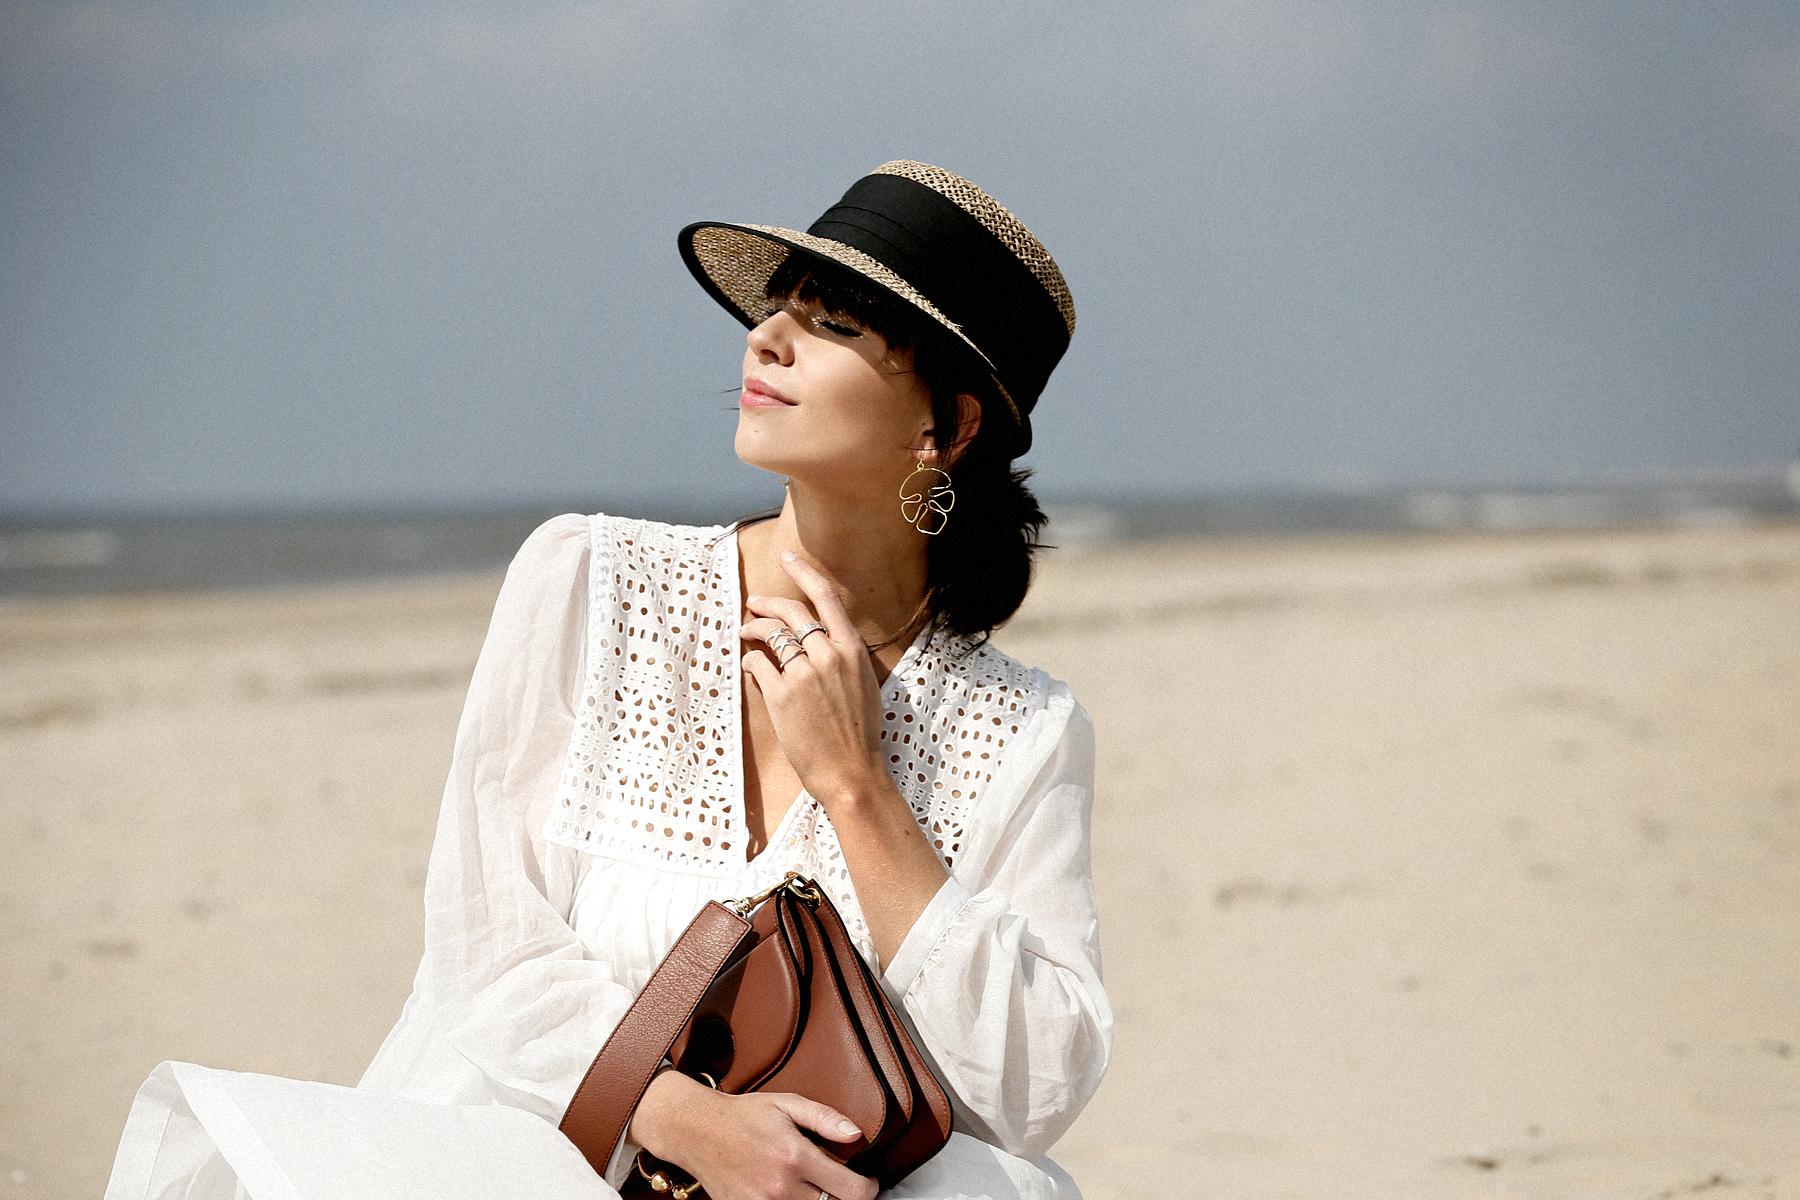 breuninger beach white dress closed j.w.anderson pierce bag straw hat summertime sunshine photography editorial vogue fashionblogger düsseldorf cats&dogs blog ricarda schernus modeblogger 3